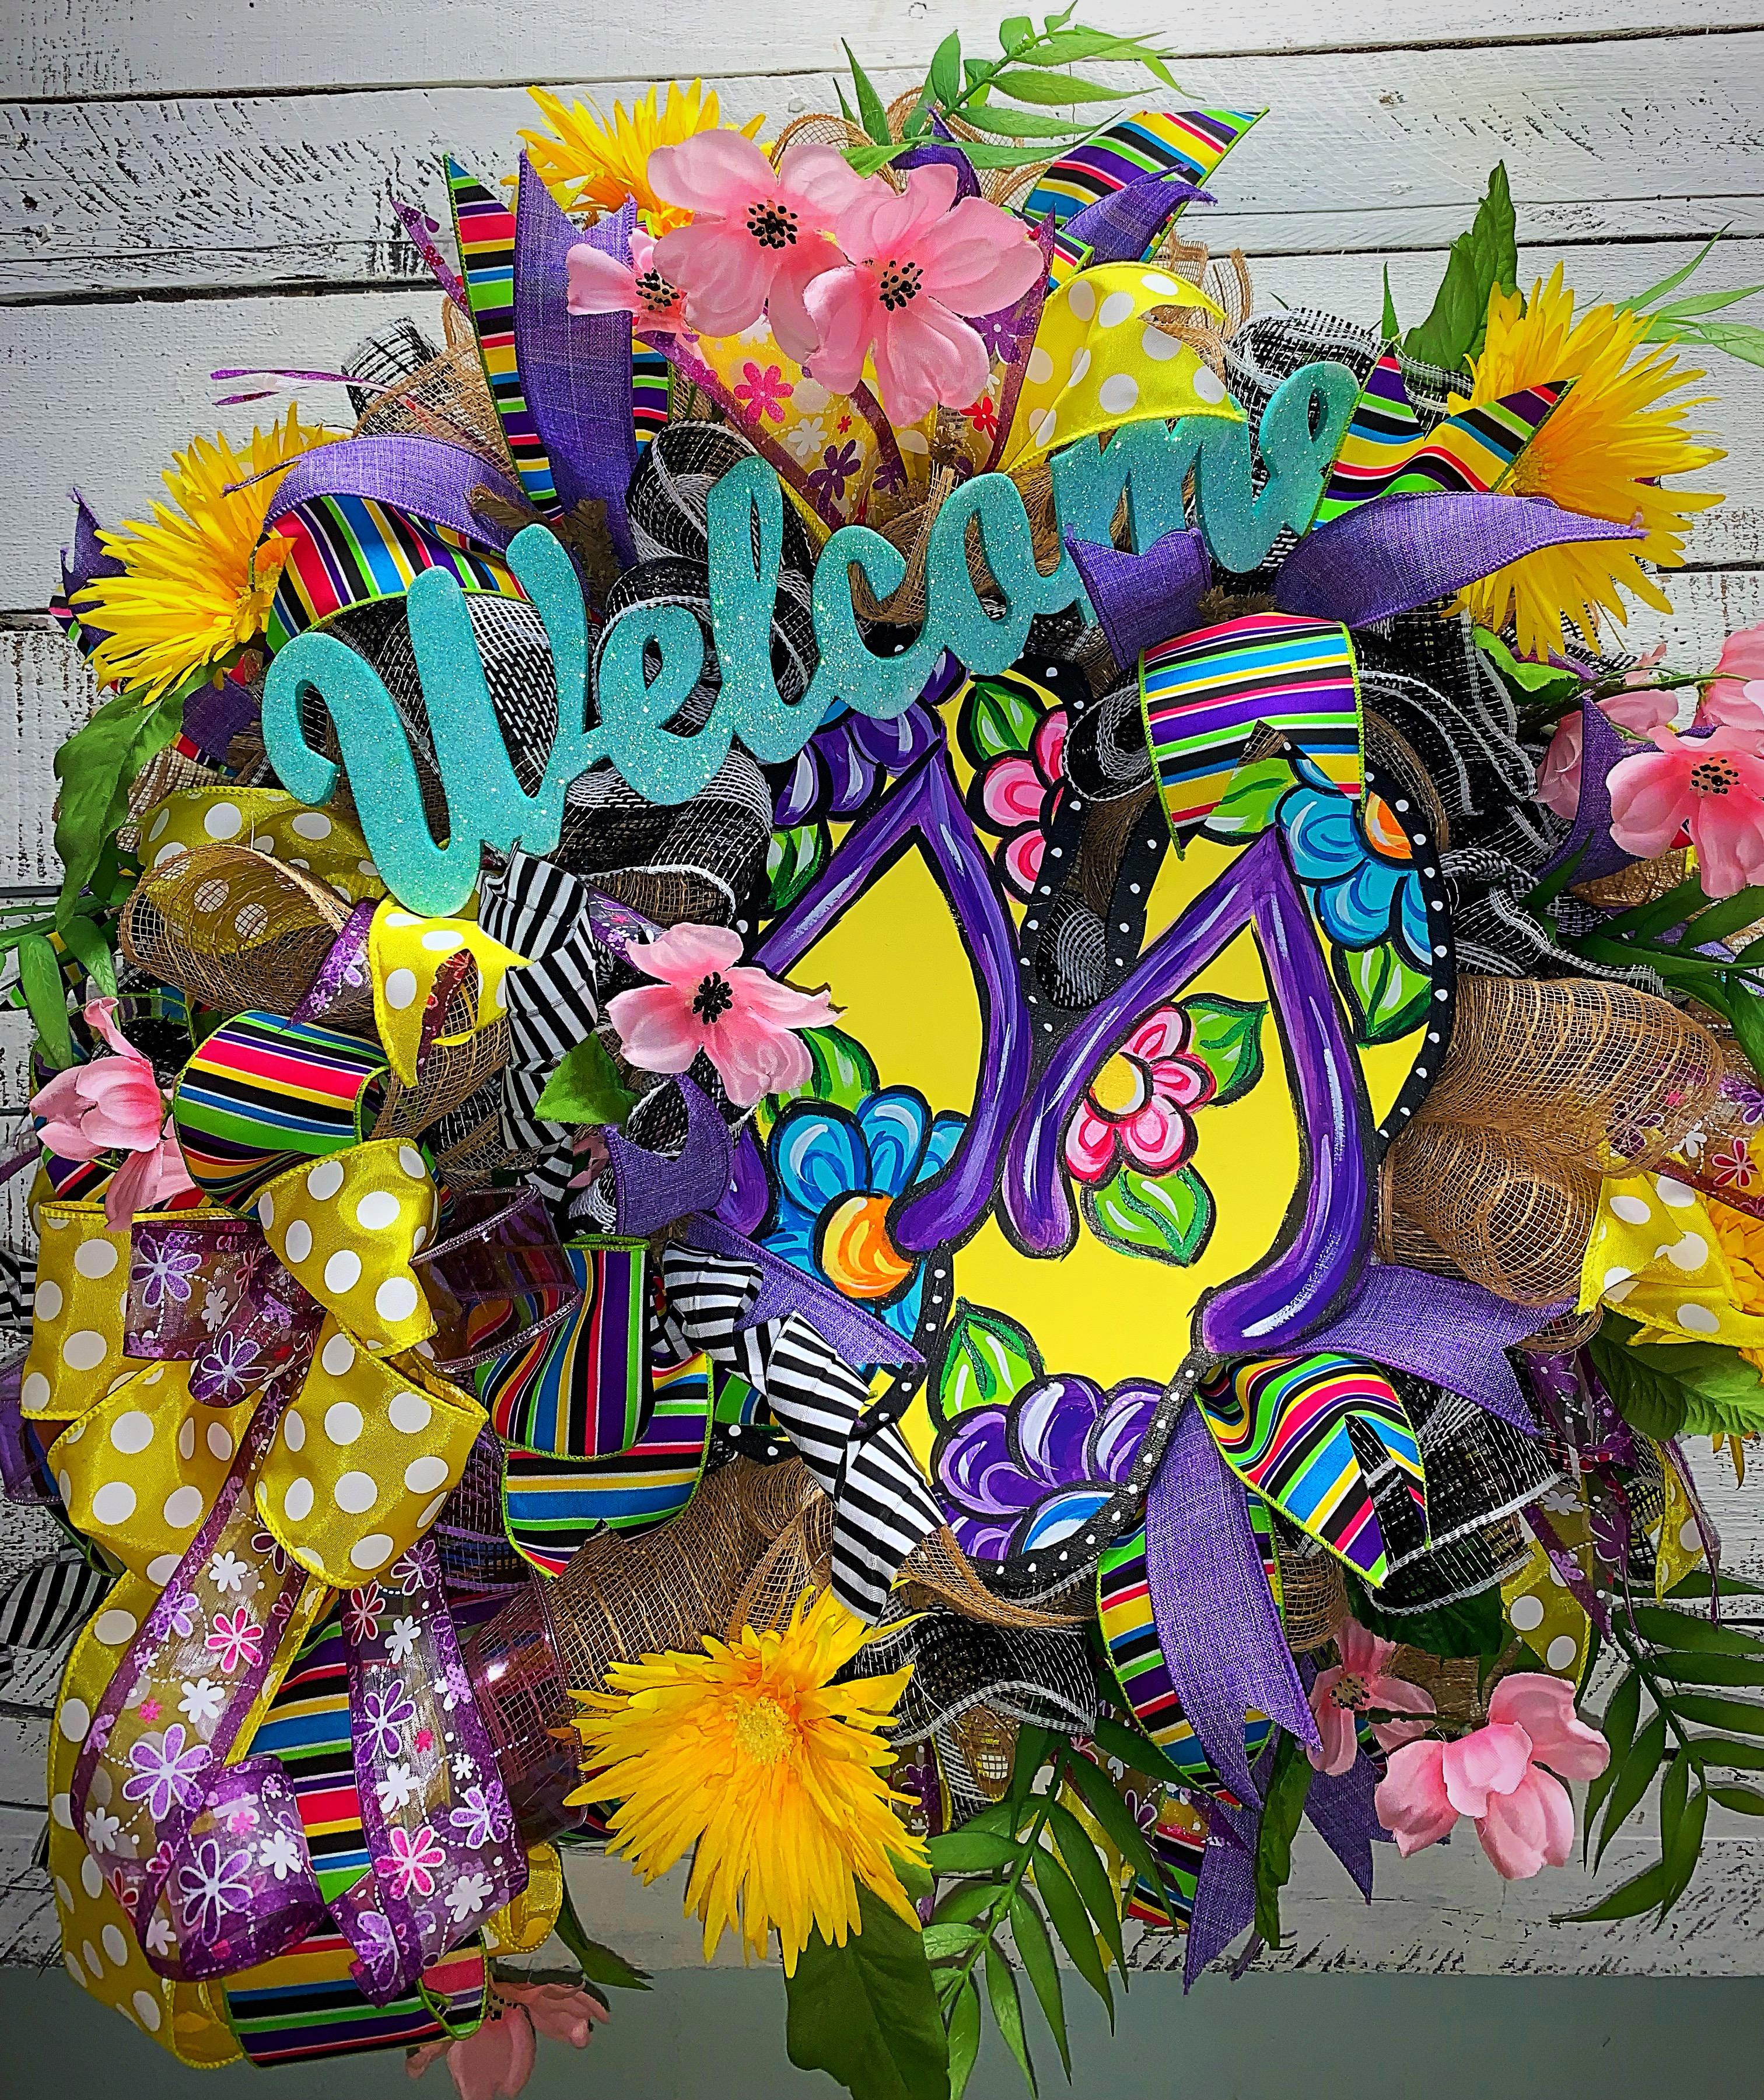 Home Decor For Sale: Summer Wreath, Flip Flop Wreath, Facebook Live Wreath